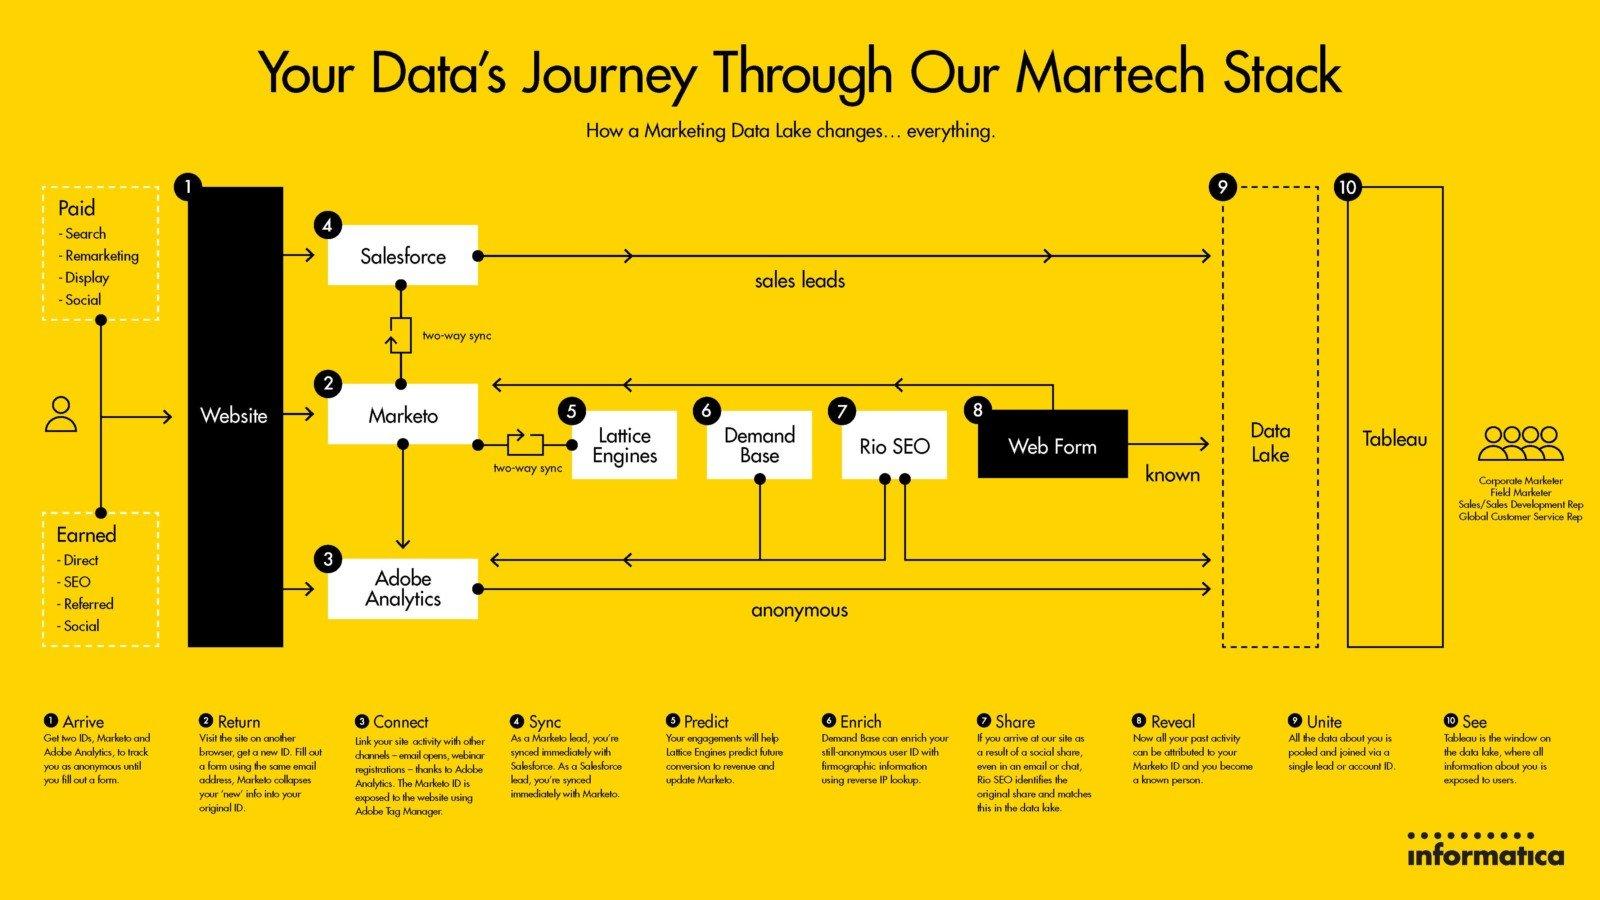 Informatica-MarTech-Stack-800x450@2x